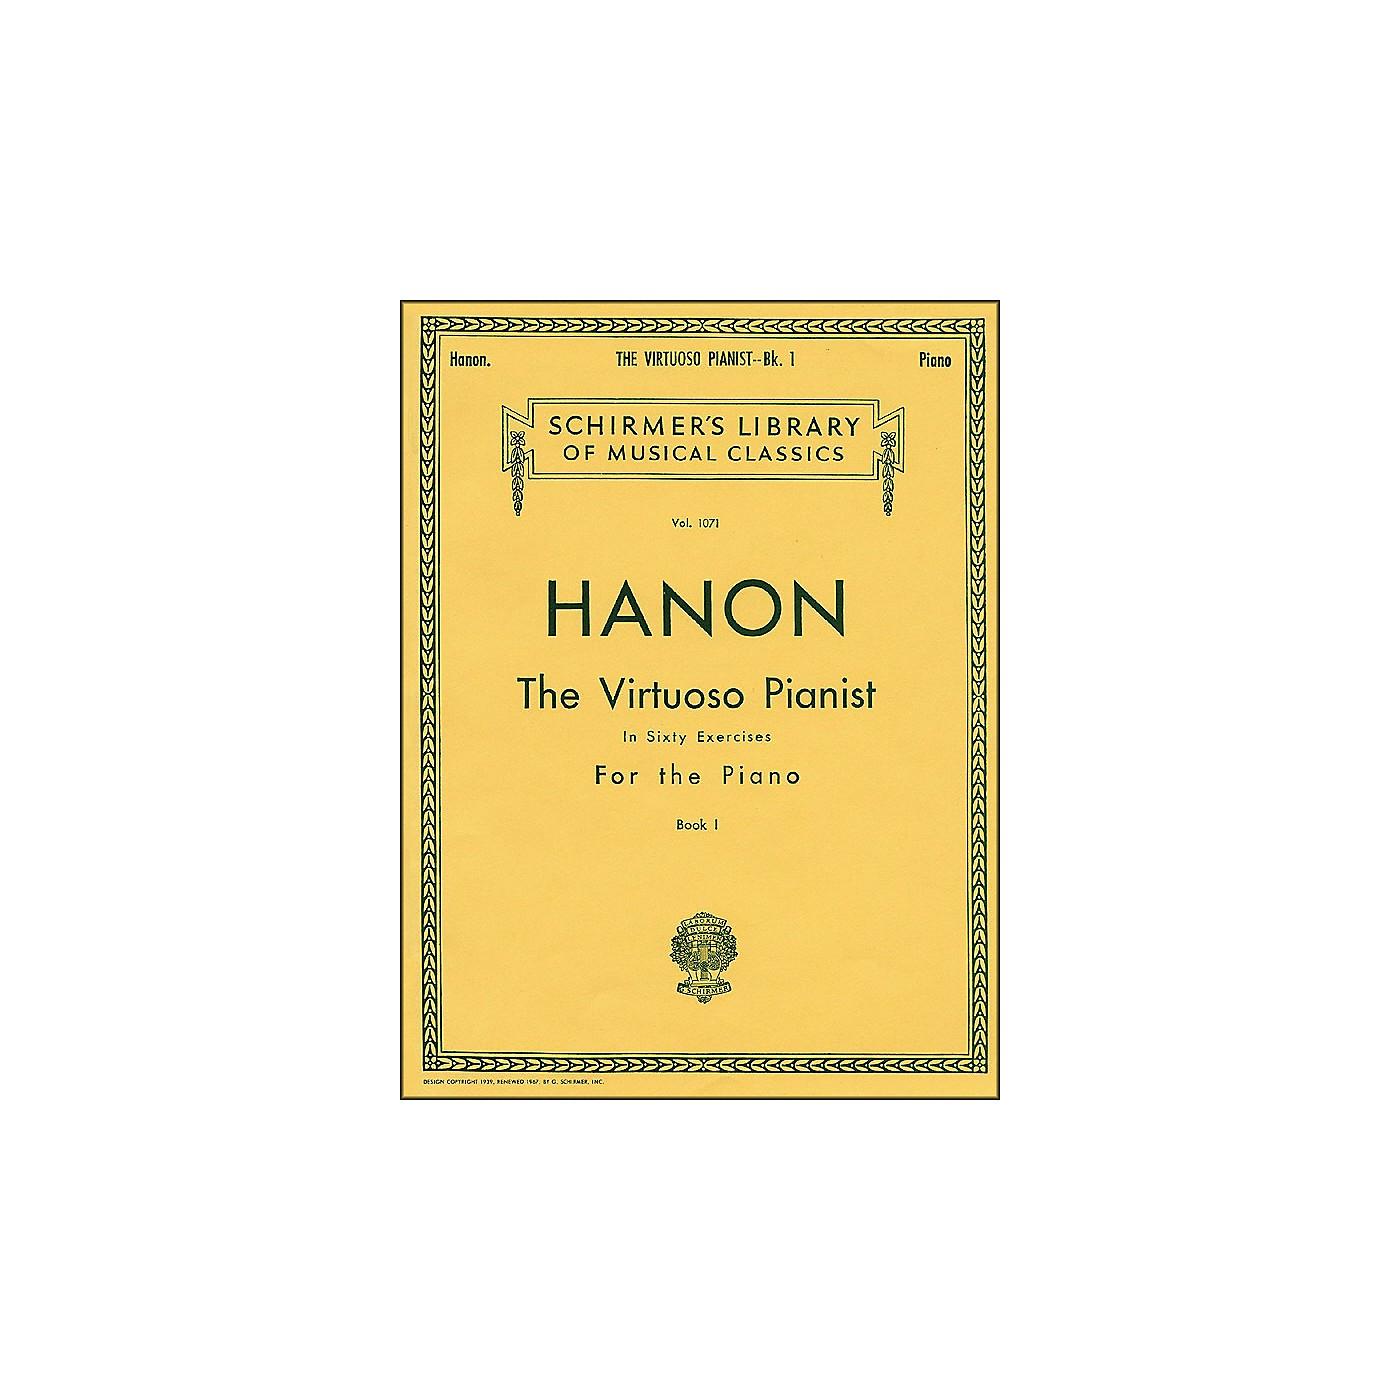 G. Schirmer Hanon Virtuoso Pianist Book 1 60 Exercises Nos 1-20 By Hanon thumbnail